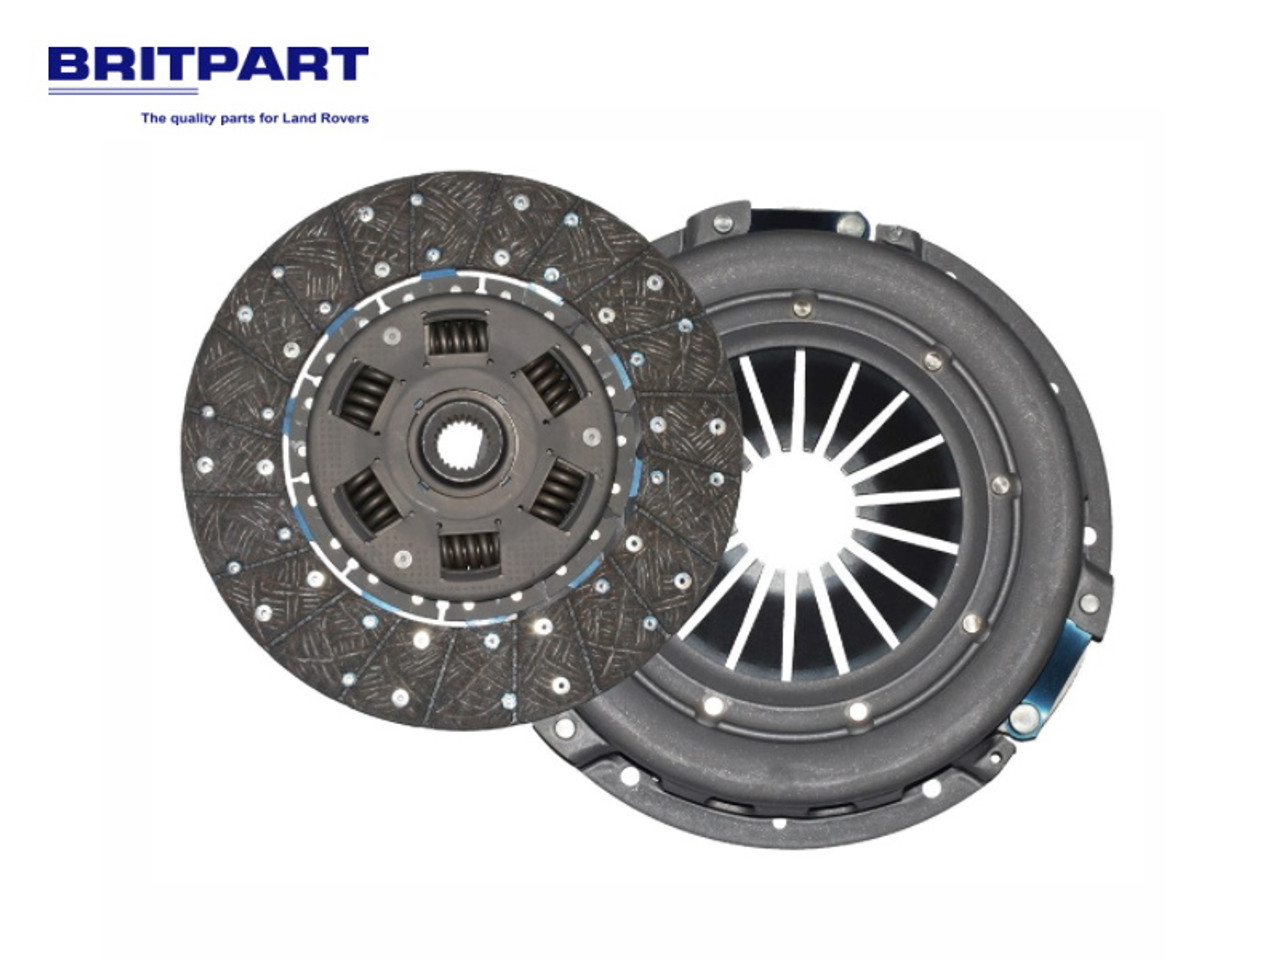 Britpart Td5 Heavy Duty Solid Flywheel Replacement Clutch Kit - DA2357CP